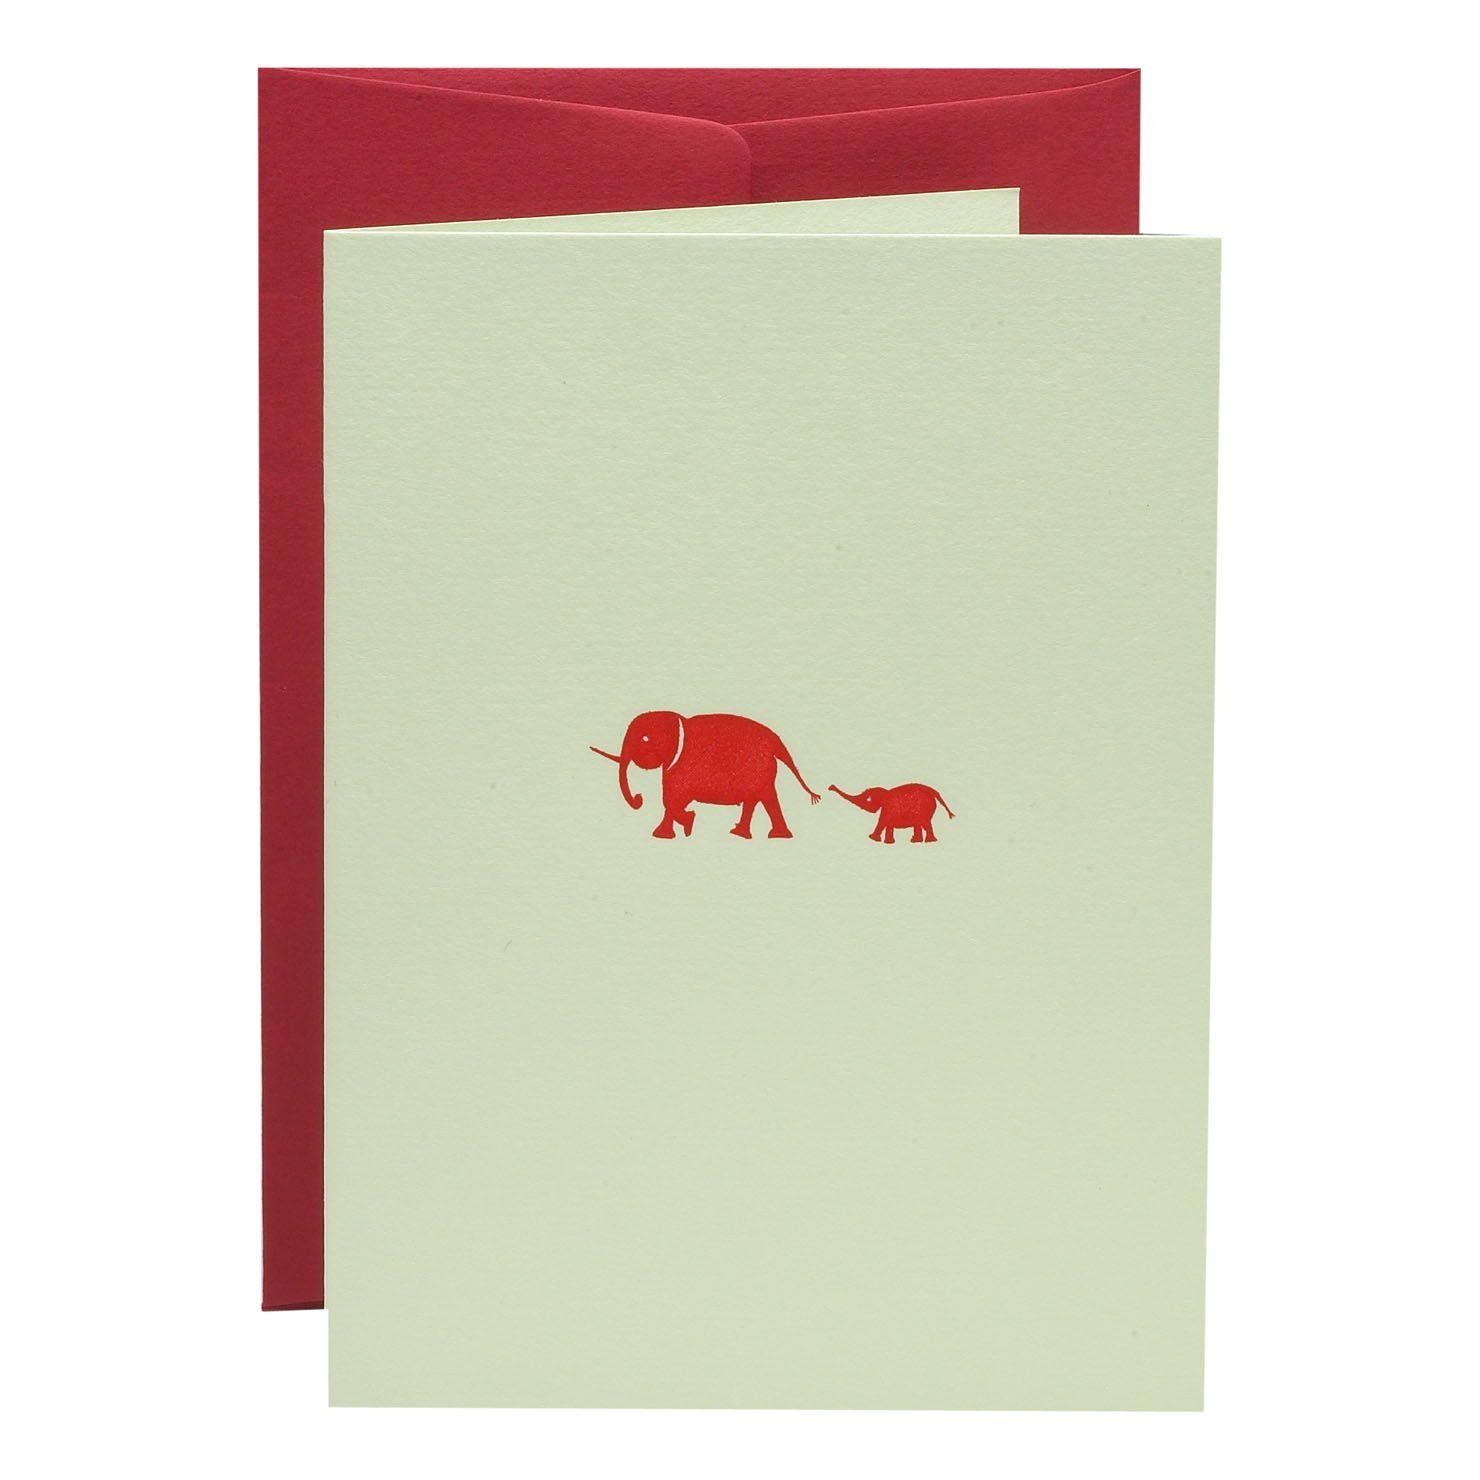 Julie Bell A6 Folded Elephant Cards & Envelopes In Box